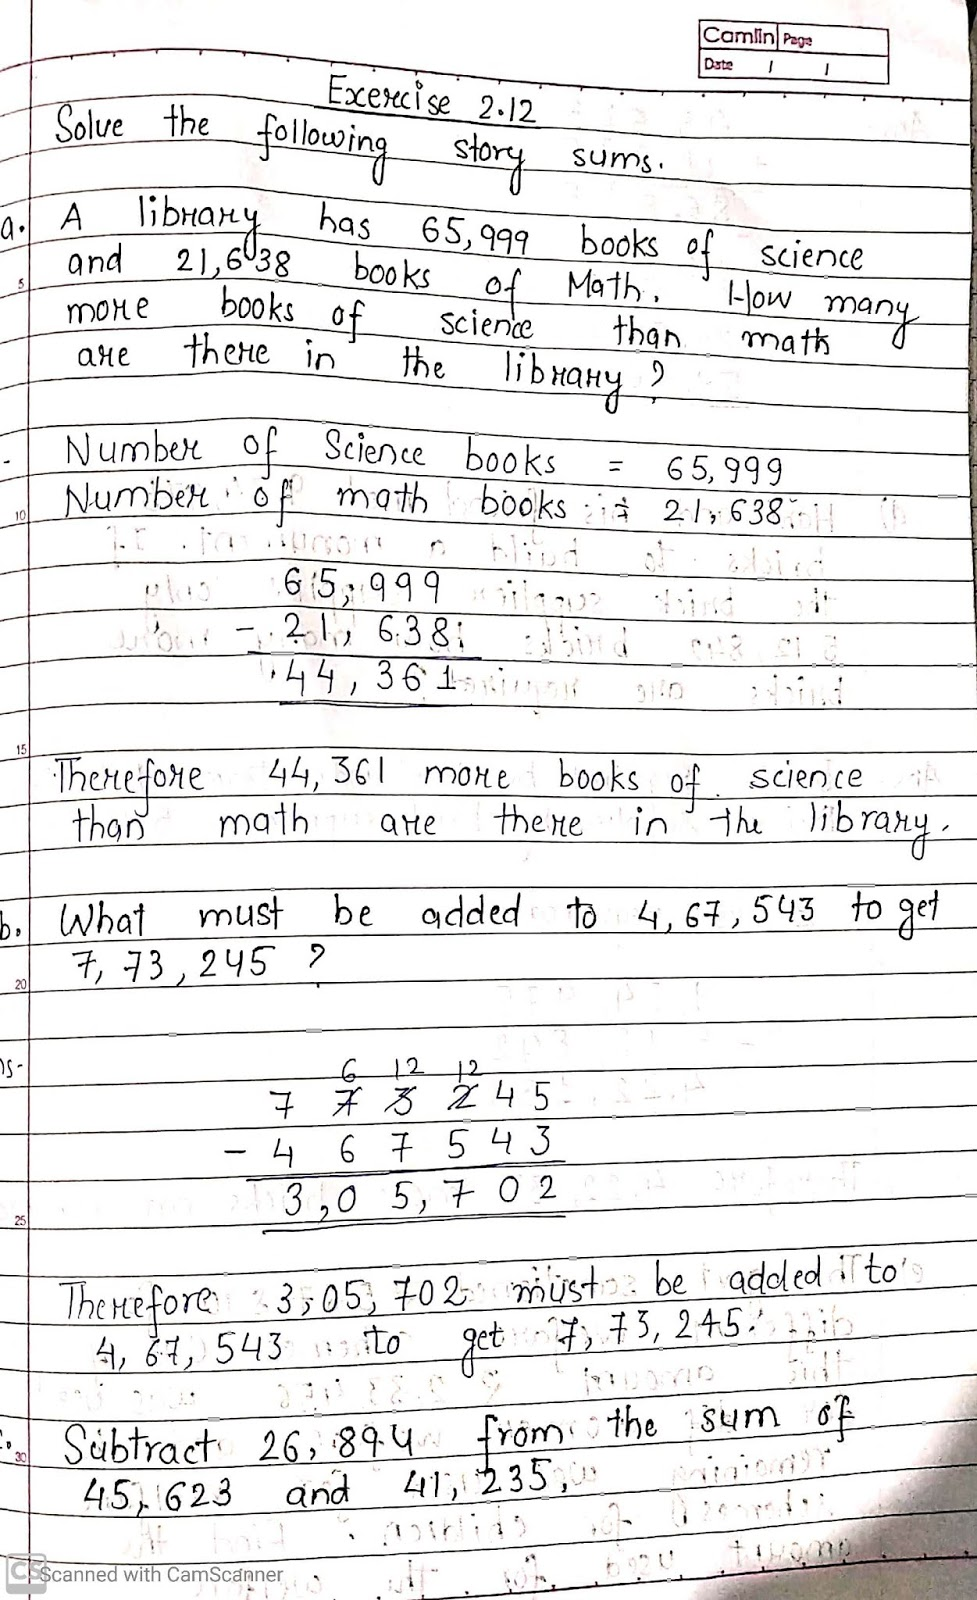 PIS BARODA STD-4: 29/4/2020 Math